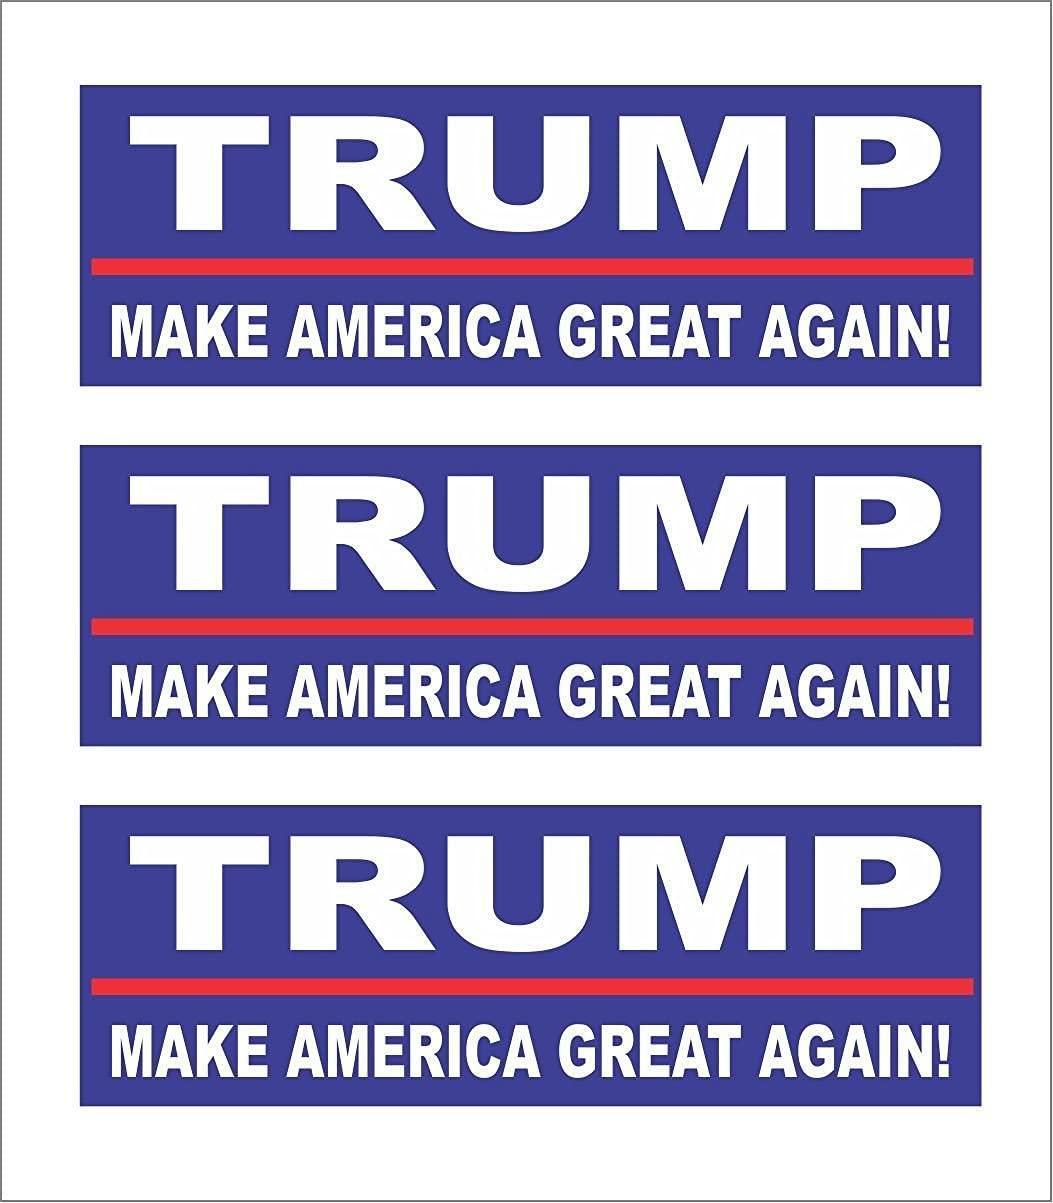 ExpressDecor (3) Trump Make America Great Again Computer Laptop Symbol Decal Family Love Car Truck Sticker Window Hard Hat Motorcycle Biker Helmet Stickers